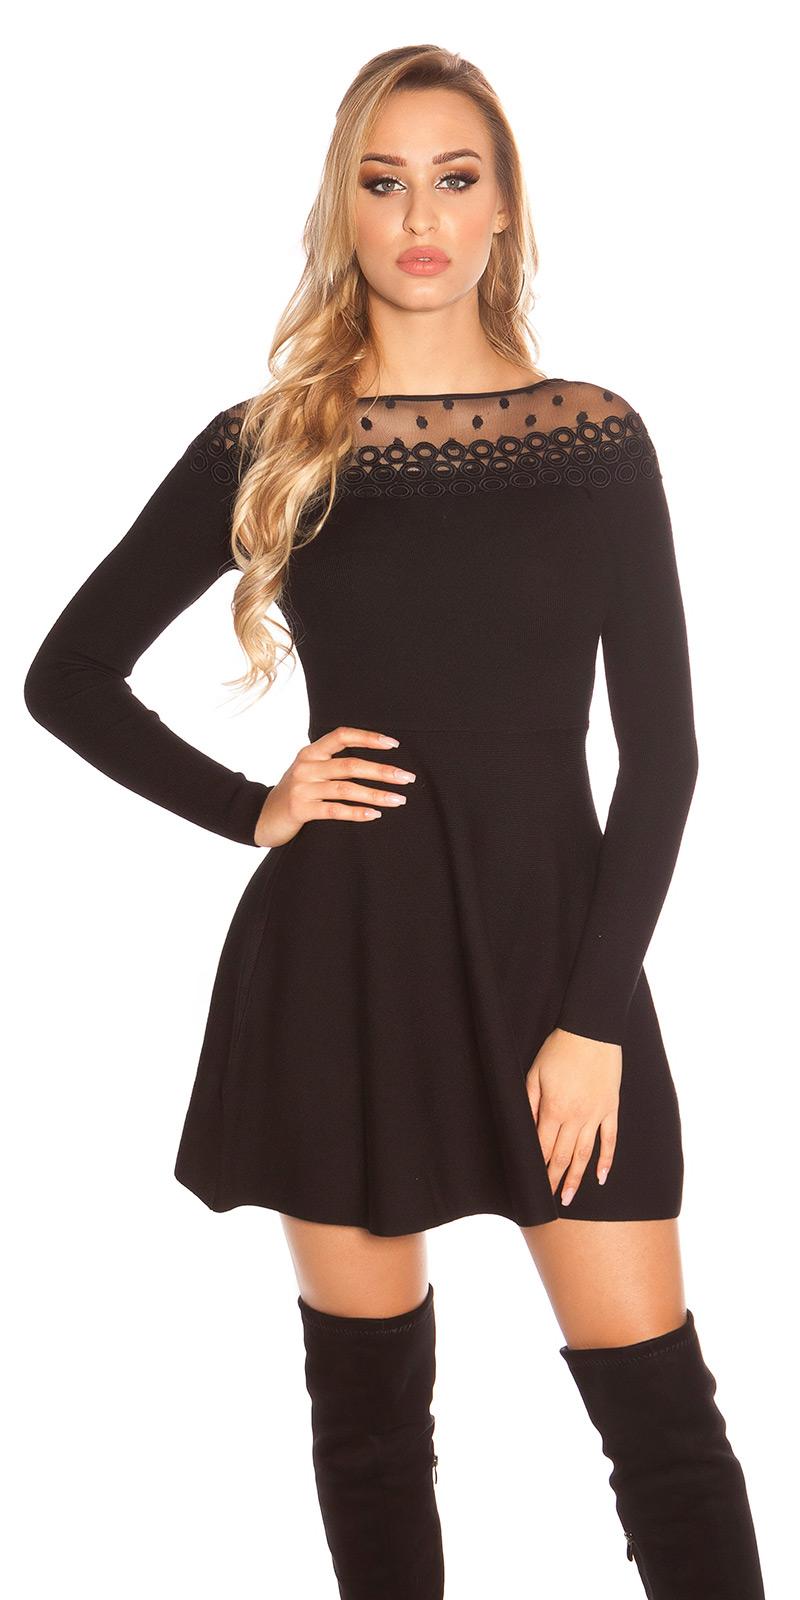 91b1f83a82083e [MB228] Czarna rozkloszowana sukienka